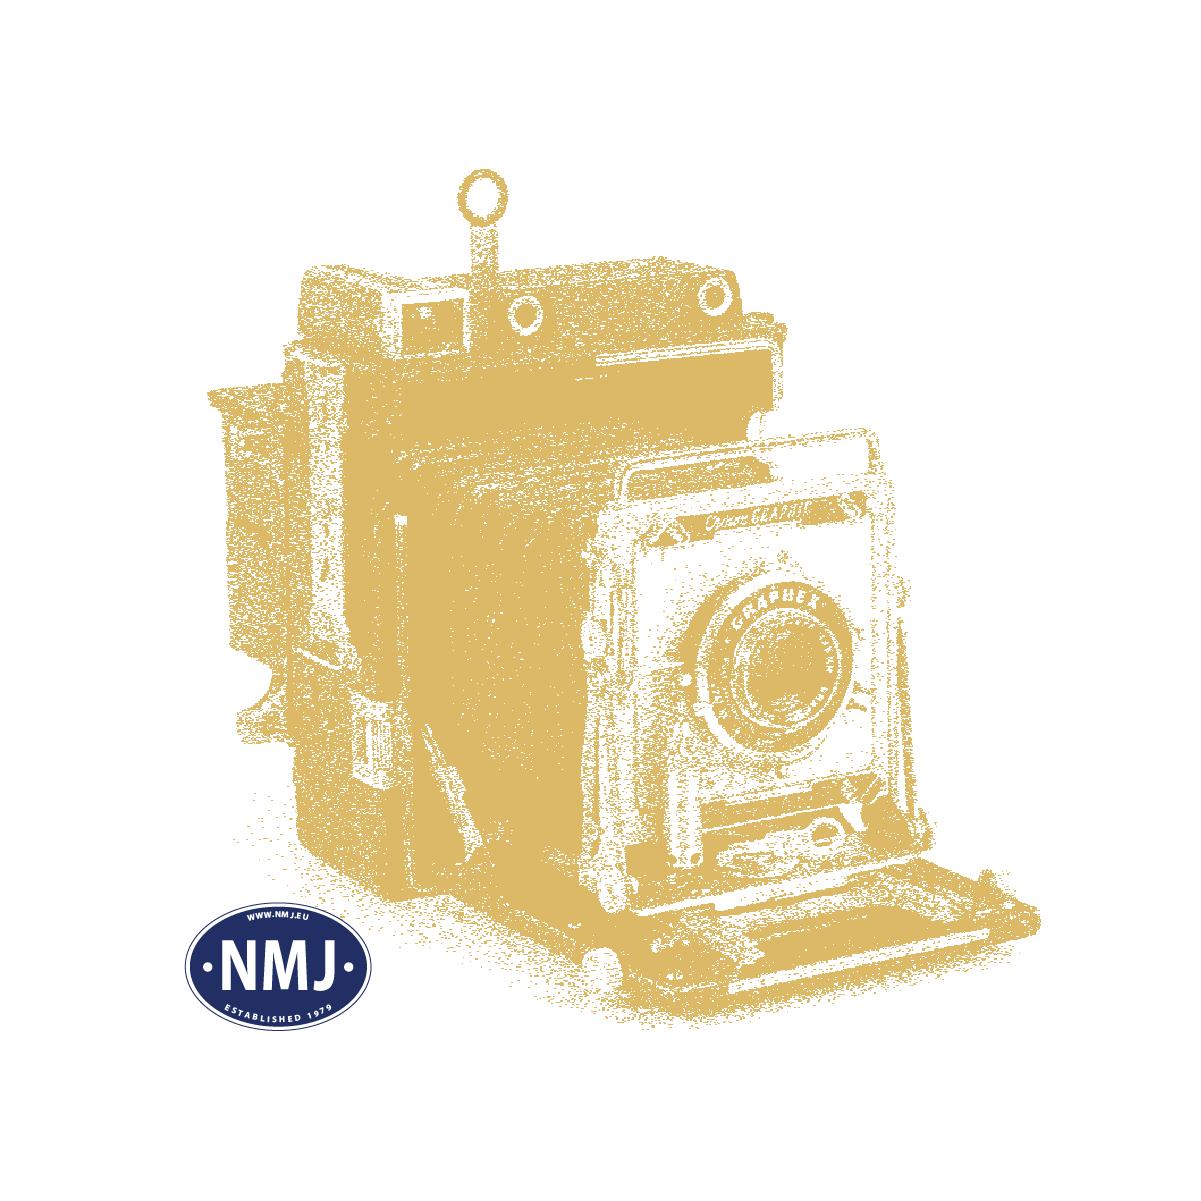 NMJT134.101 - NMJ Topline NSB DF37 21304, rotbraun (Gammeldesign)